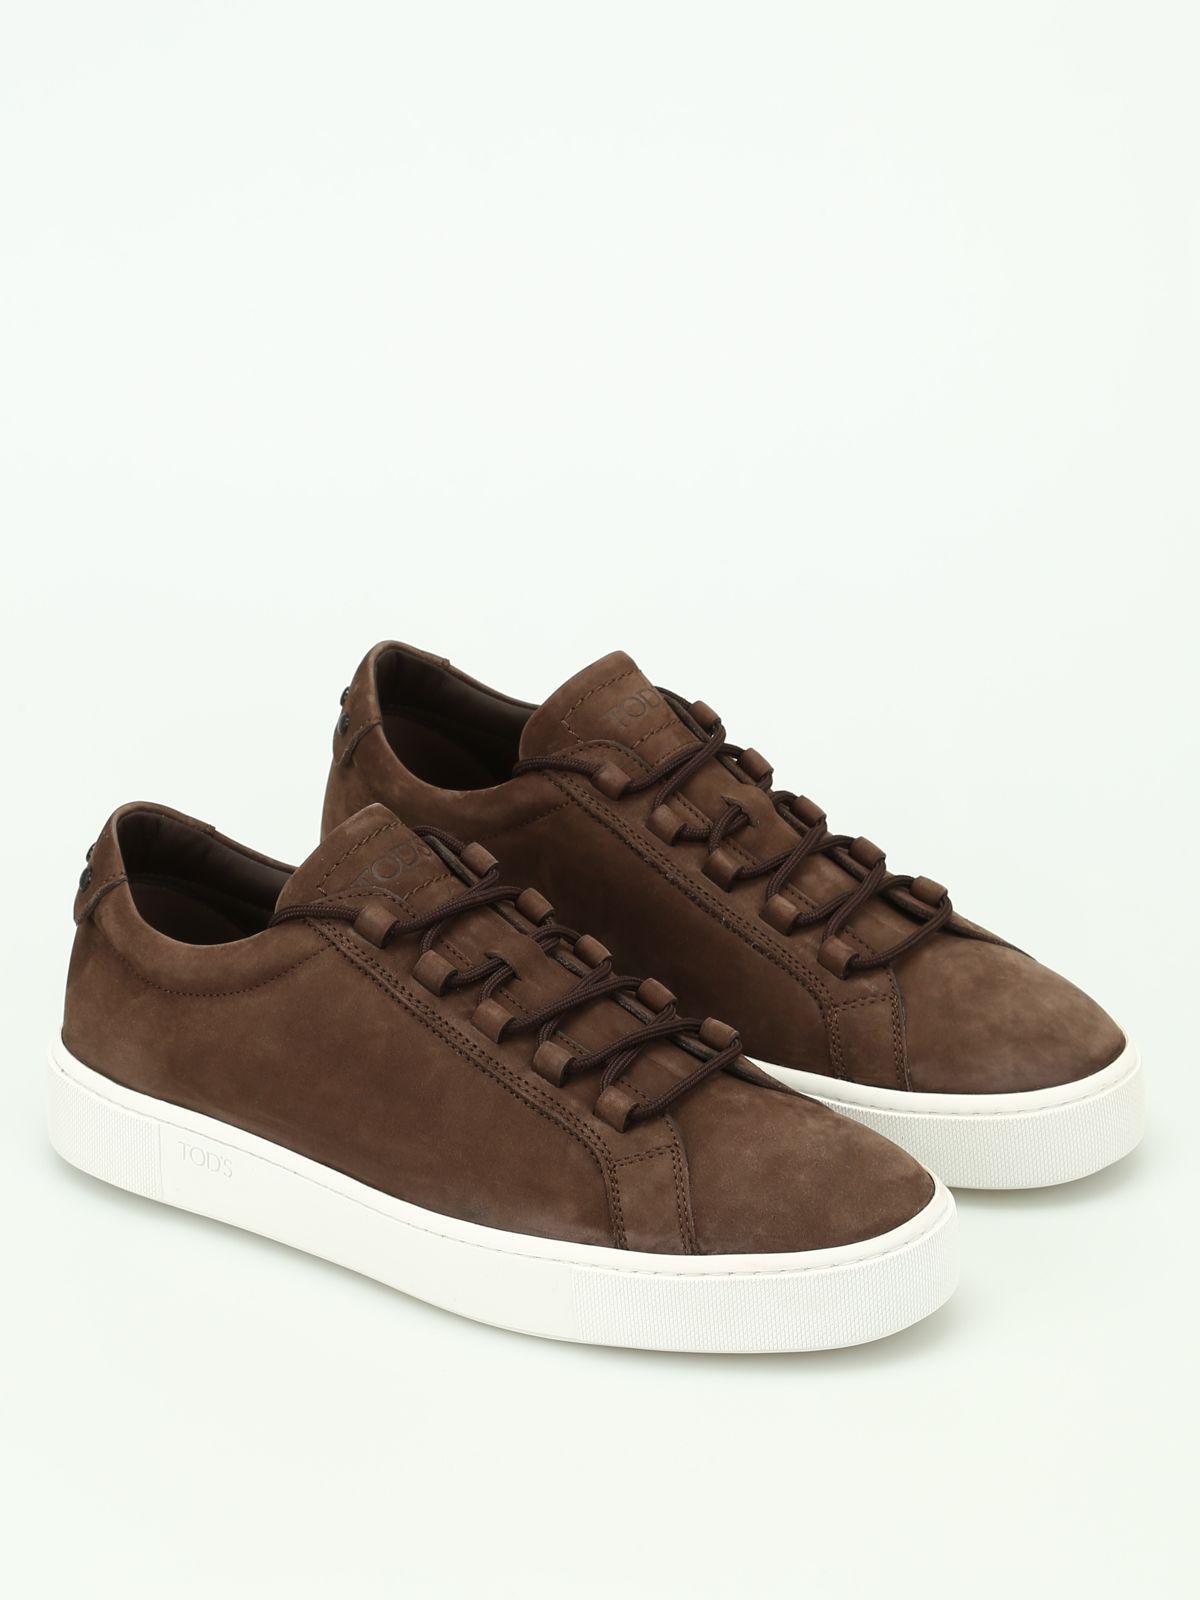 Tod's Soft Nubuck Sneakers In Brown